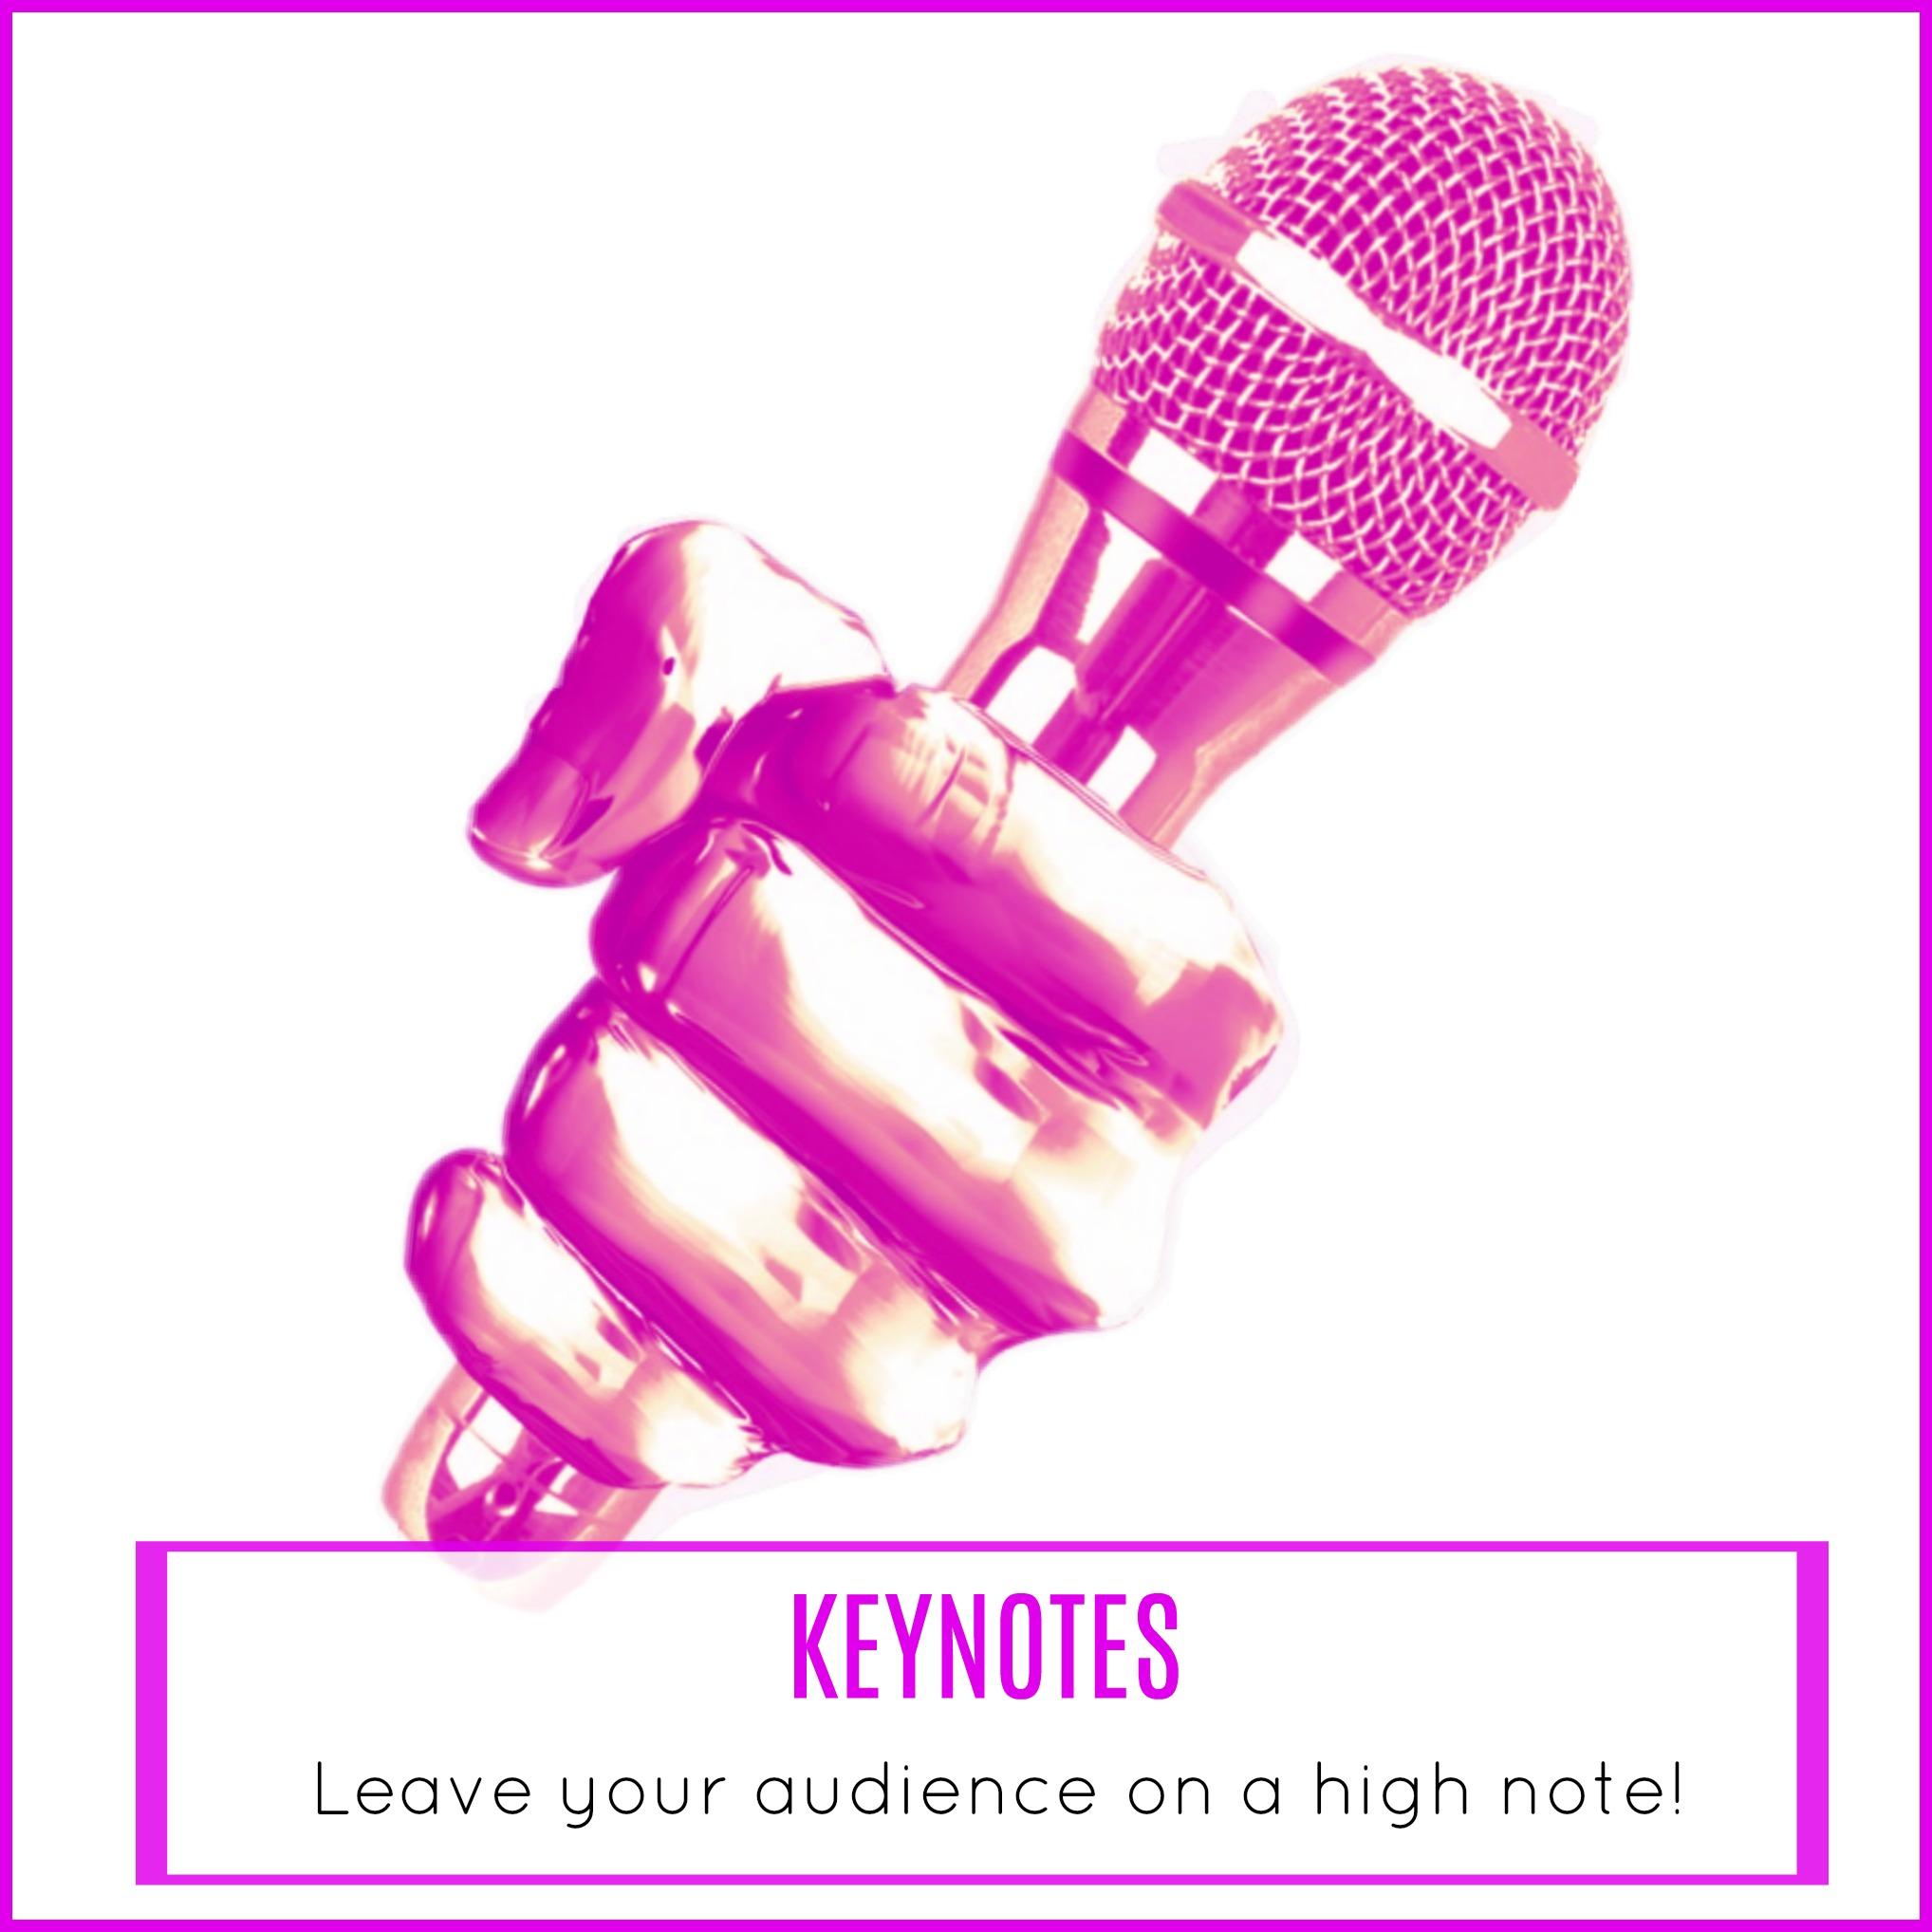 Keynotes_workshops.jpg